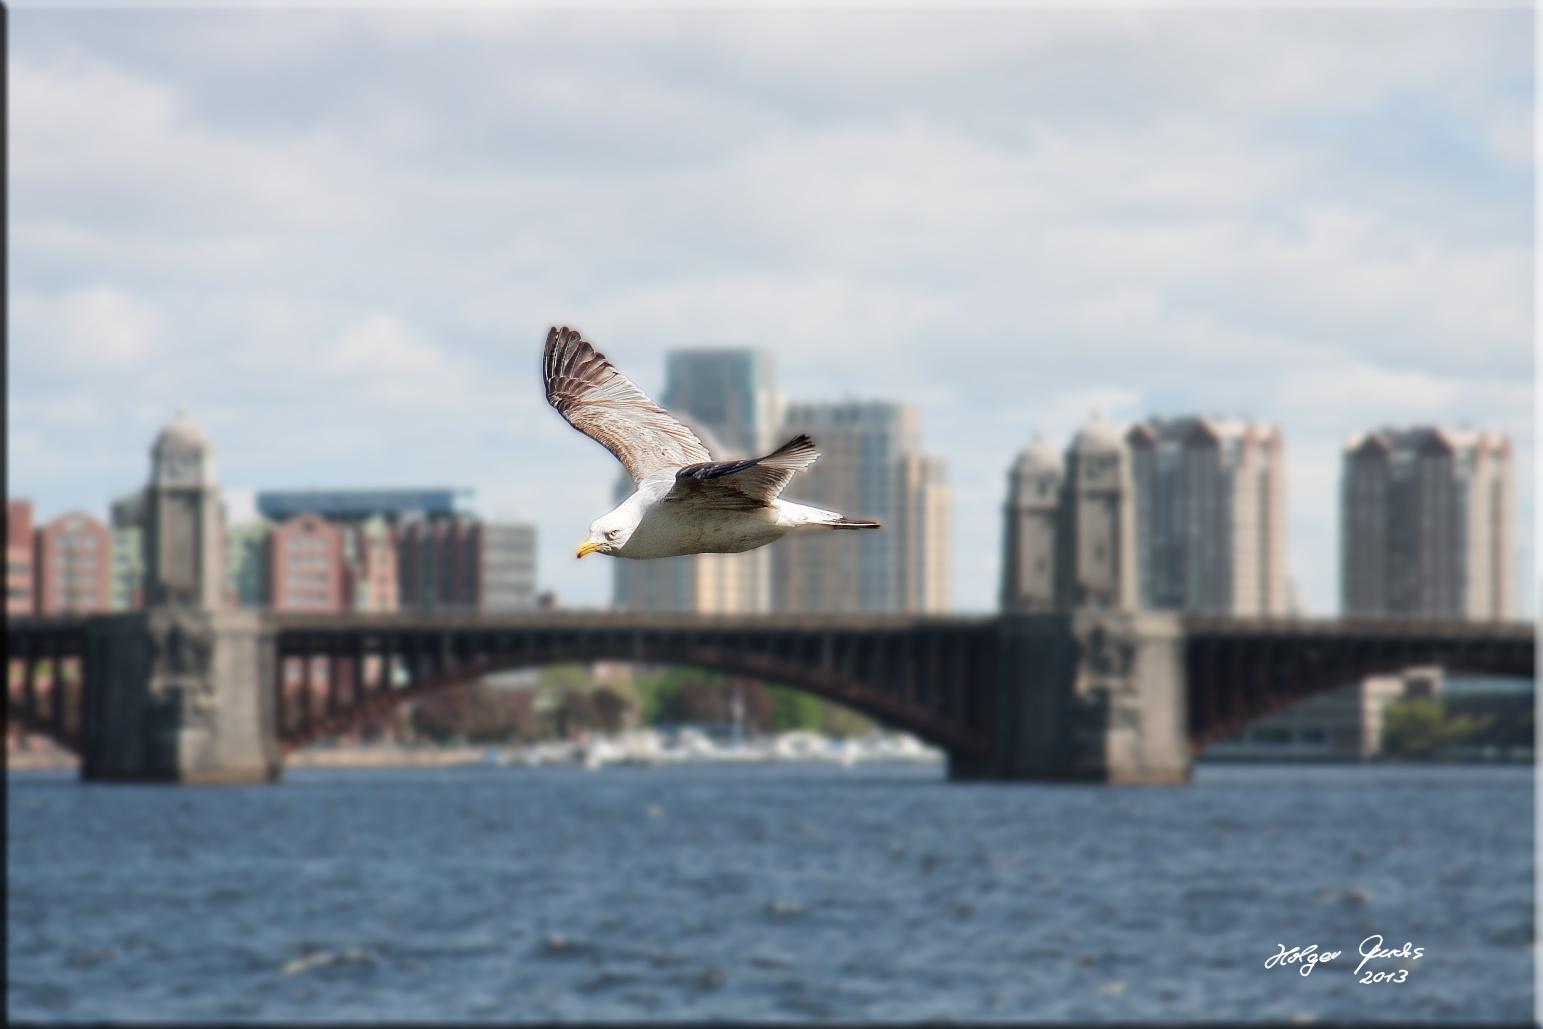 Möwe am Charles River i. Boston